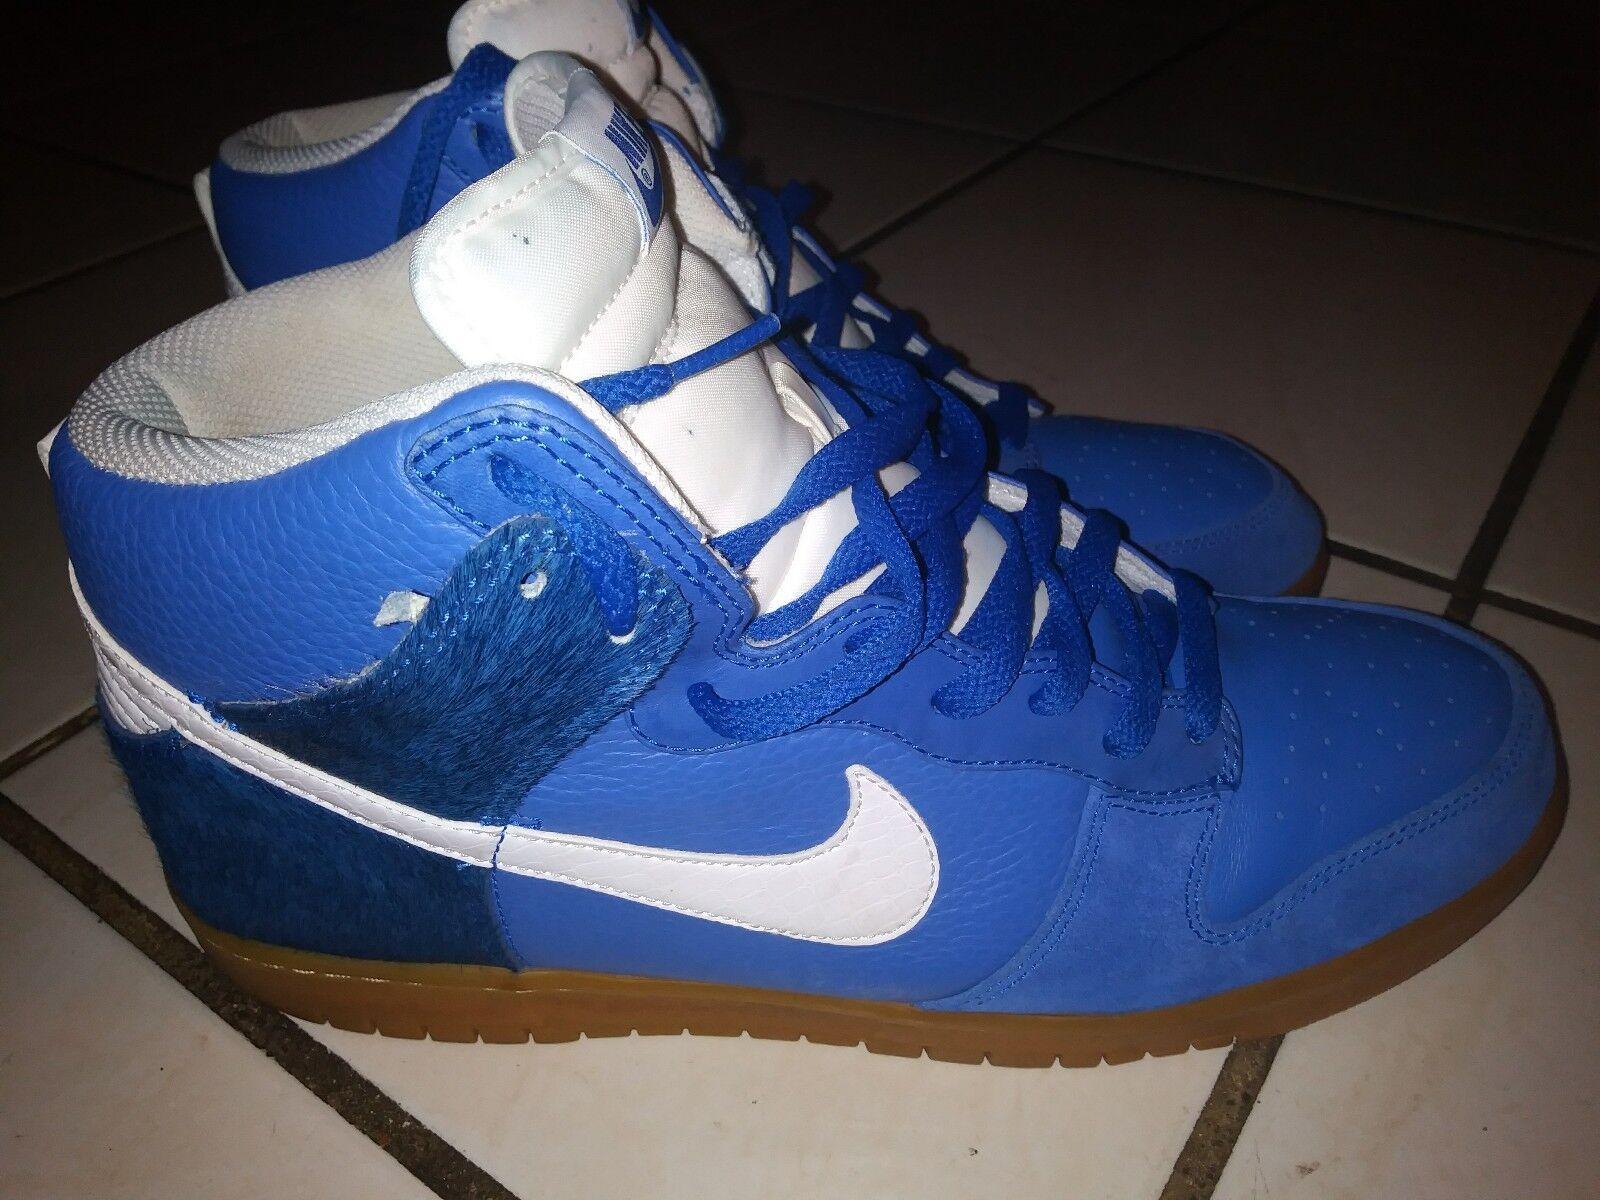 Nike Zoom Dunk Premium Horsehair Gum 317892-412 Men's Basketball shoes Size 12